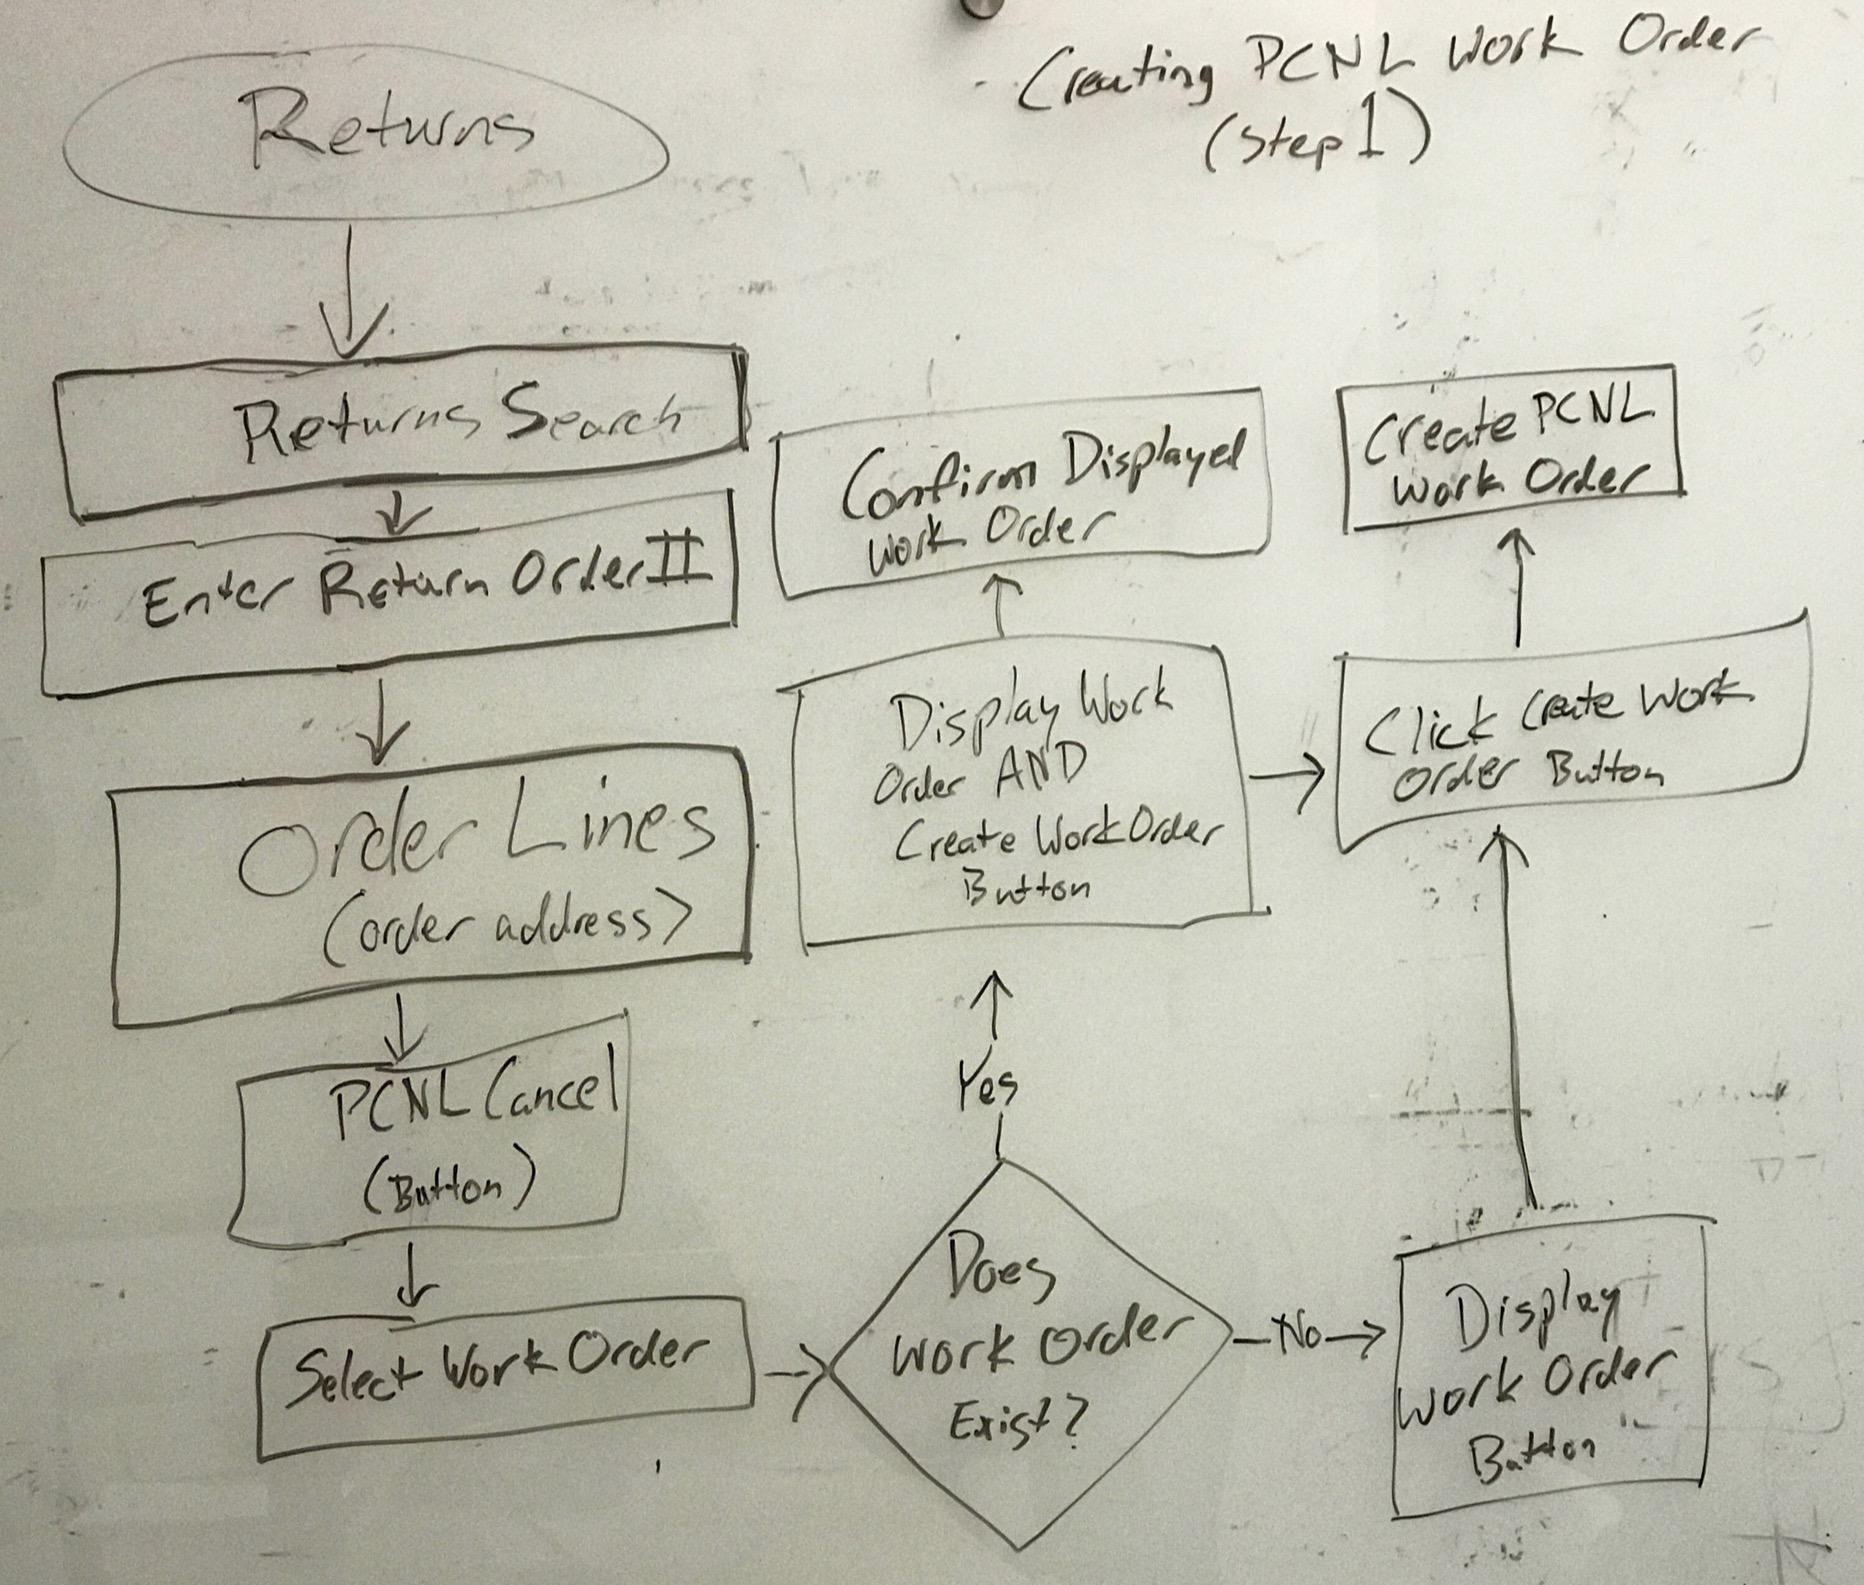 Creating PCNL Work Order (step 1)